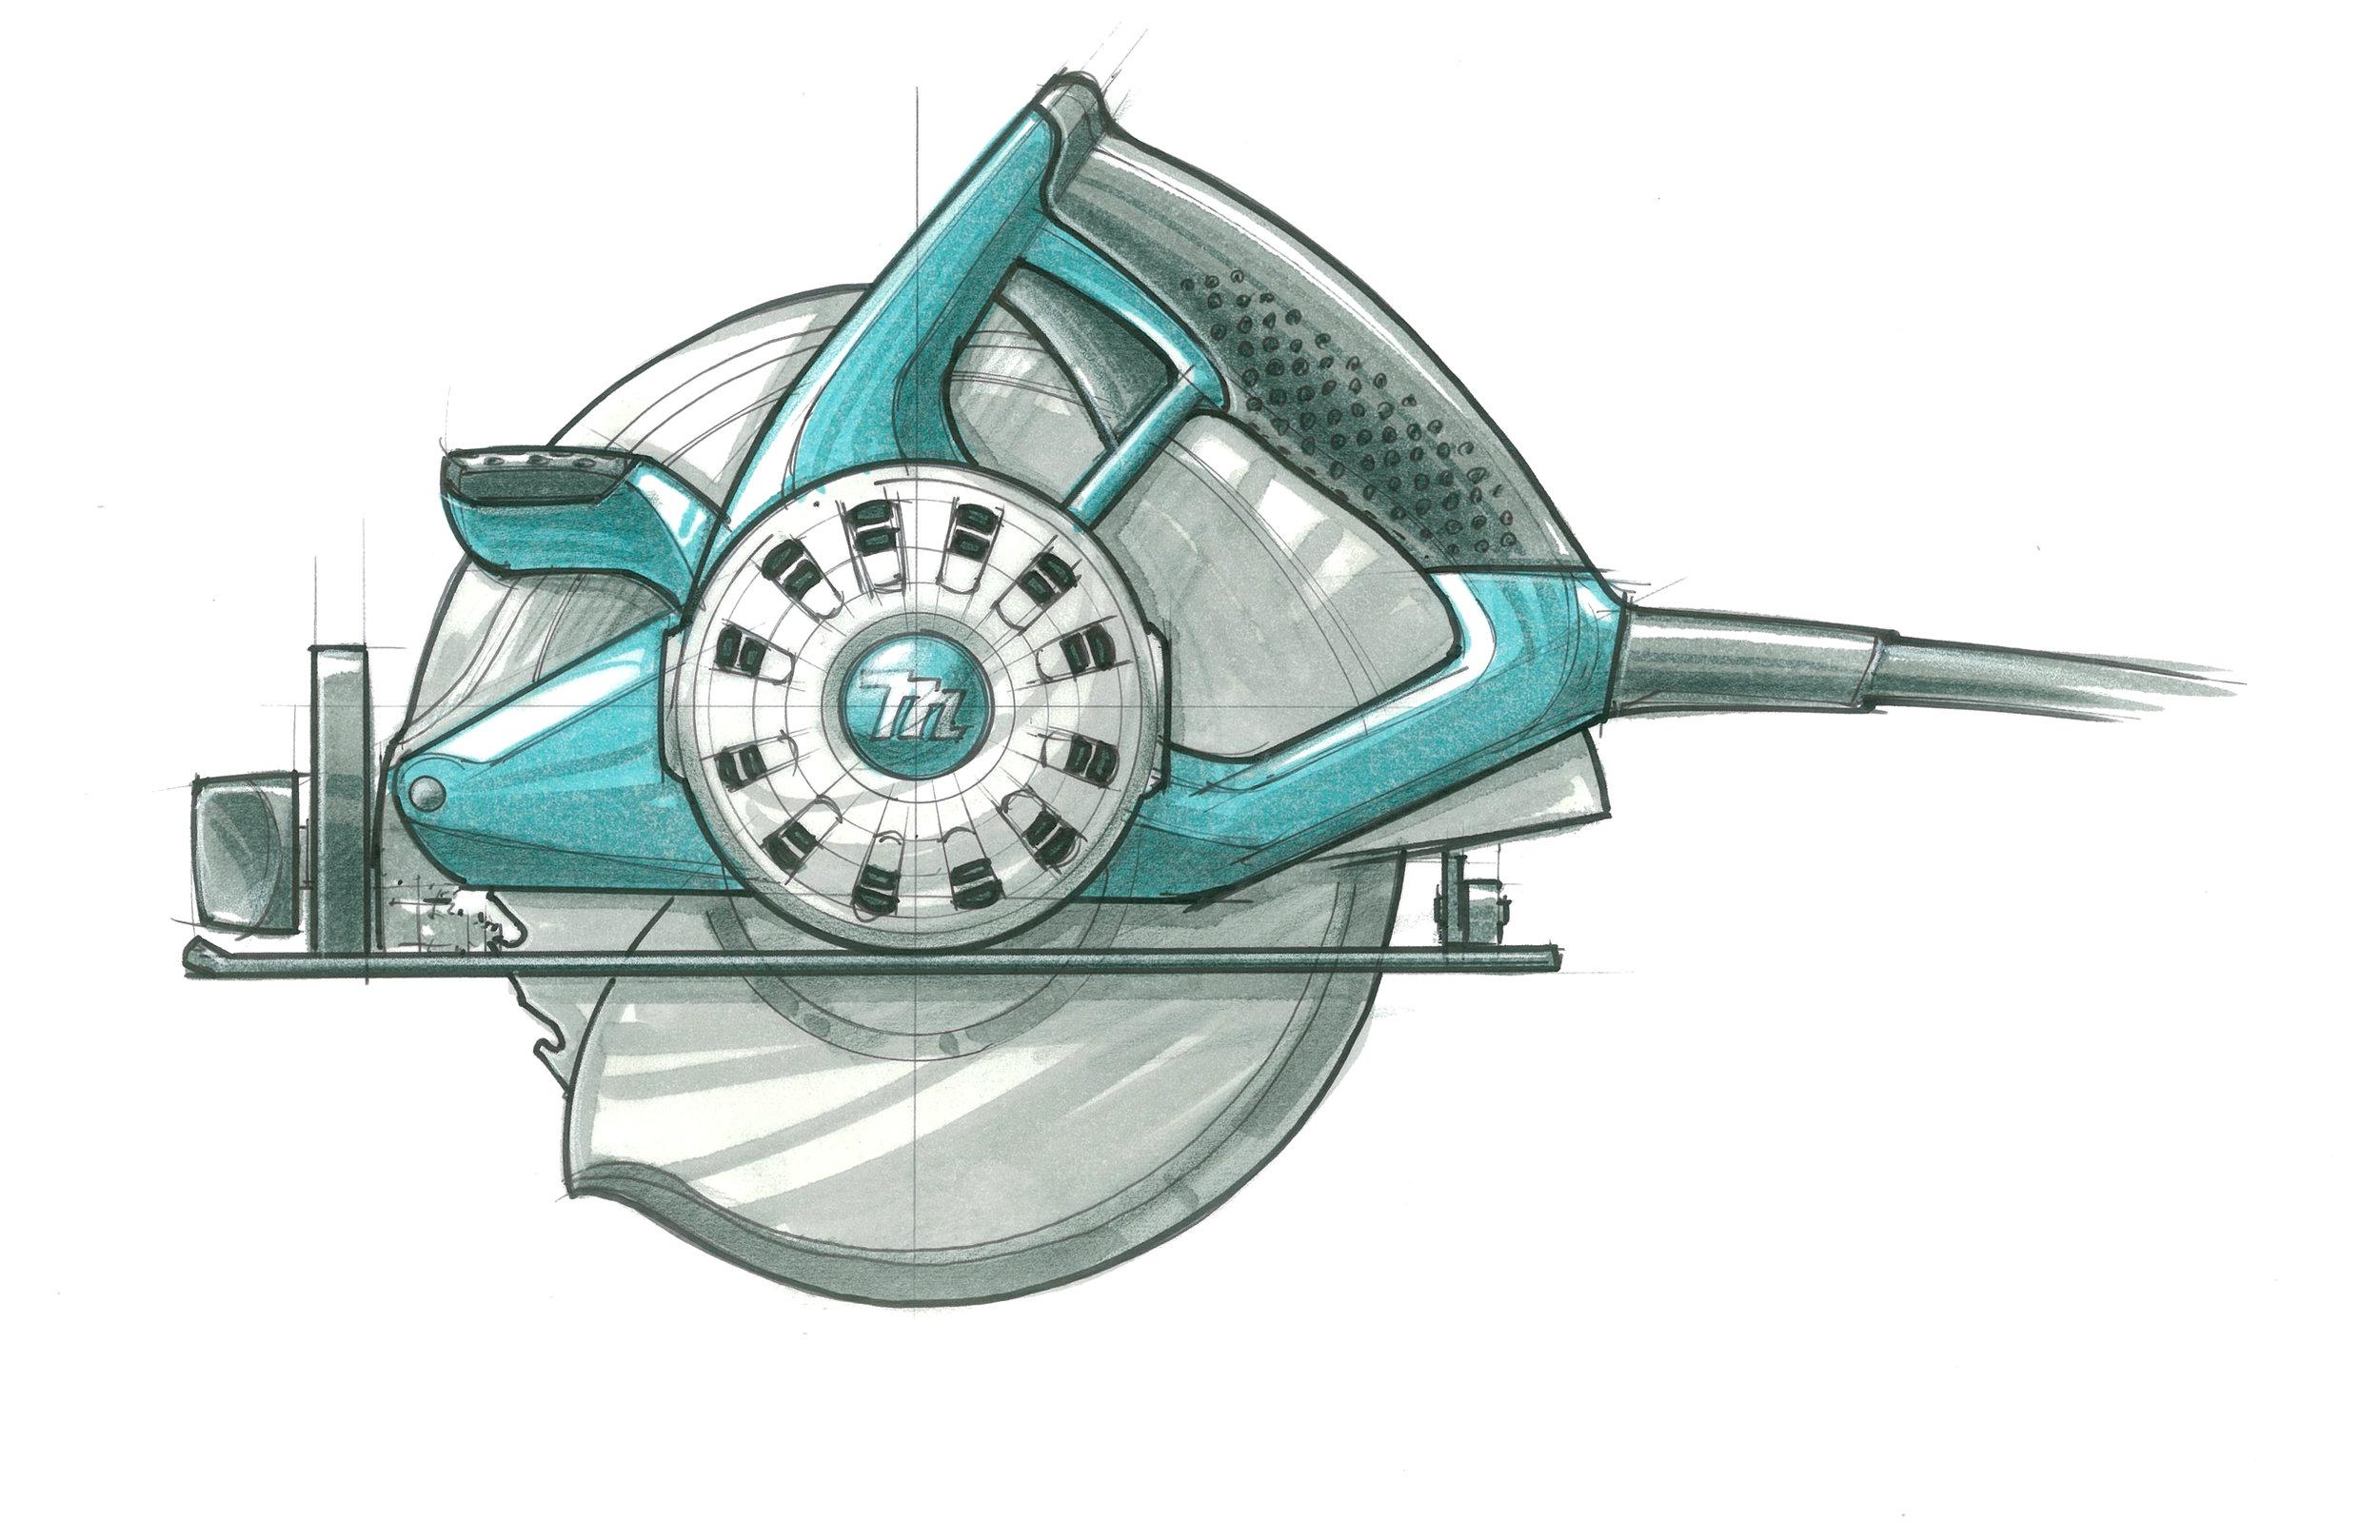 concept_Makita-v1_top-handle_rear_85%.jpg